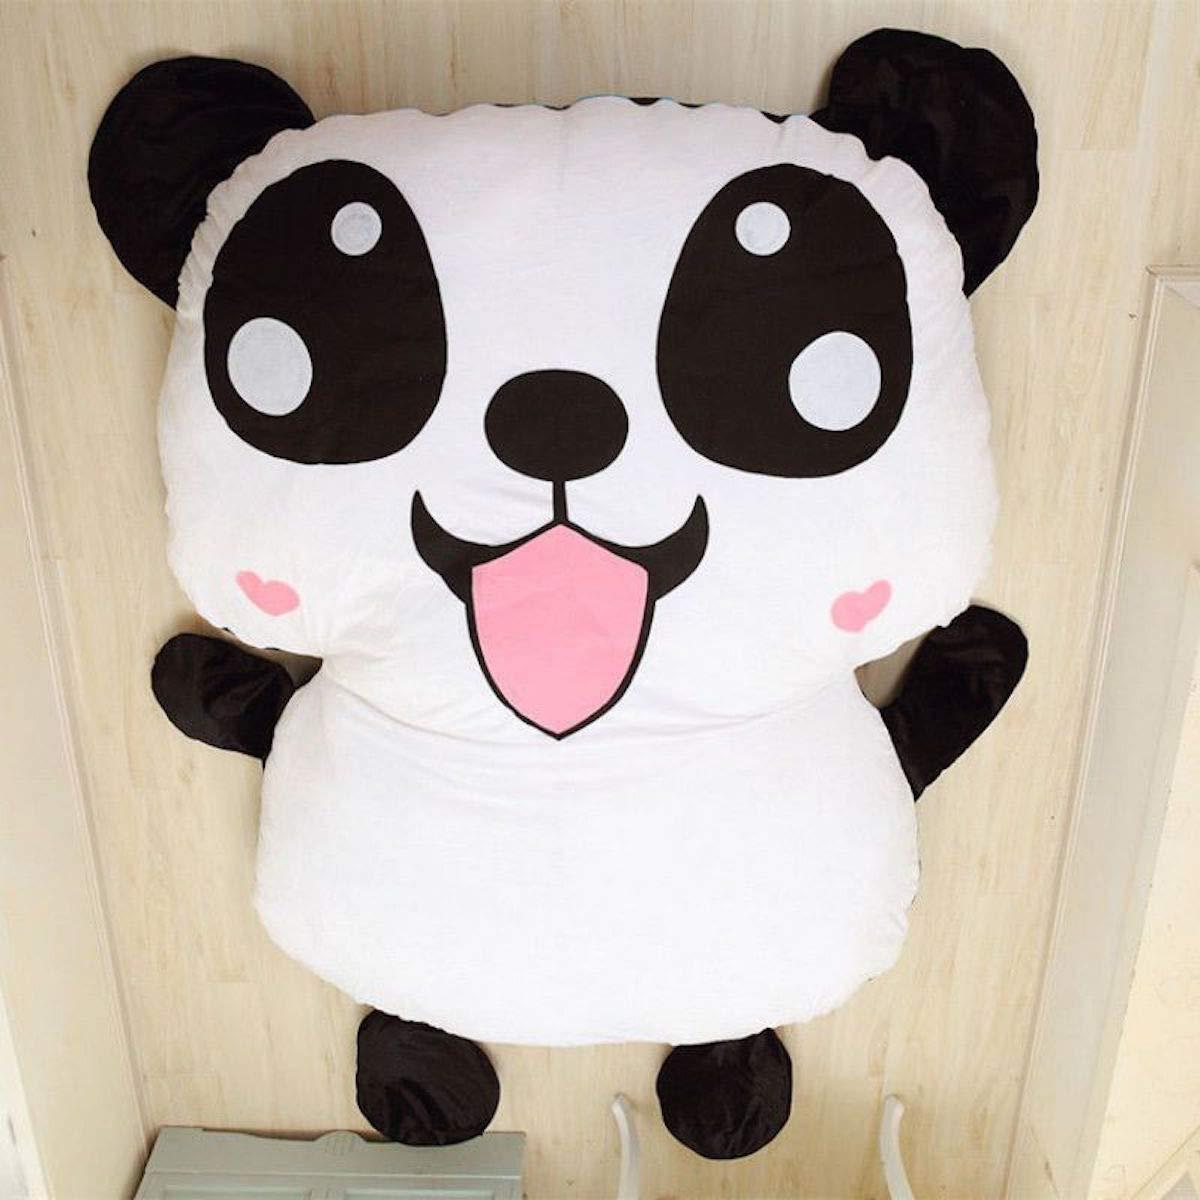 banabed-lit-panda-geant-manga-matelas-1